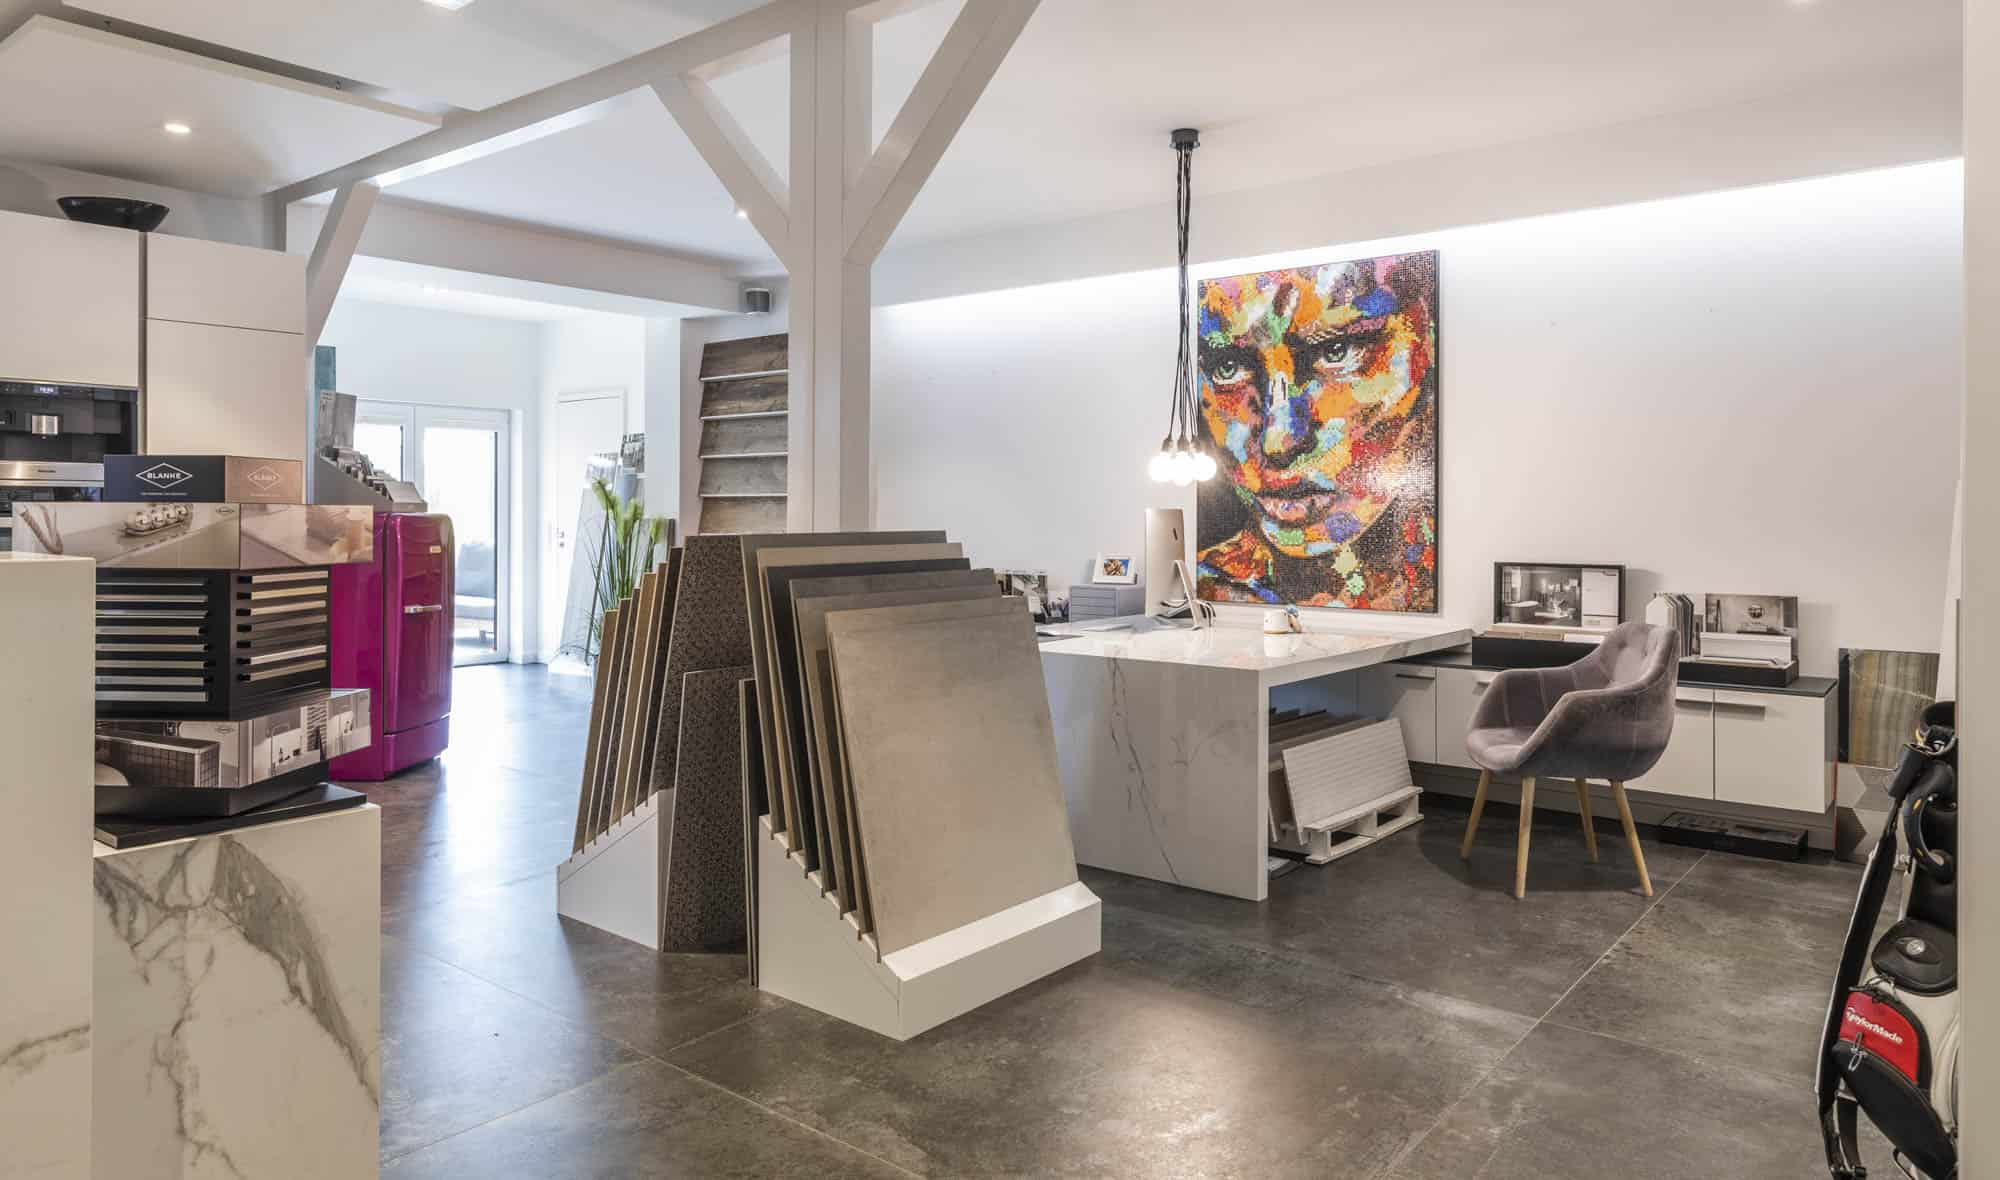 Fliesen Design Showroom Fliesen Handel in der Region Lübeck